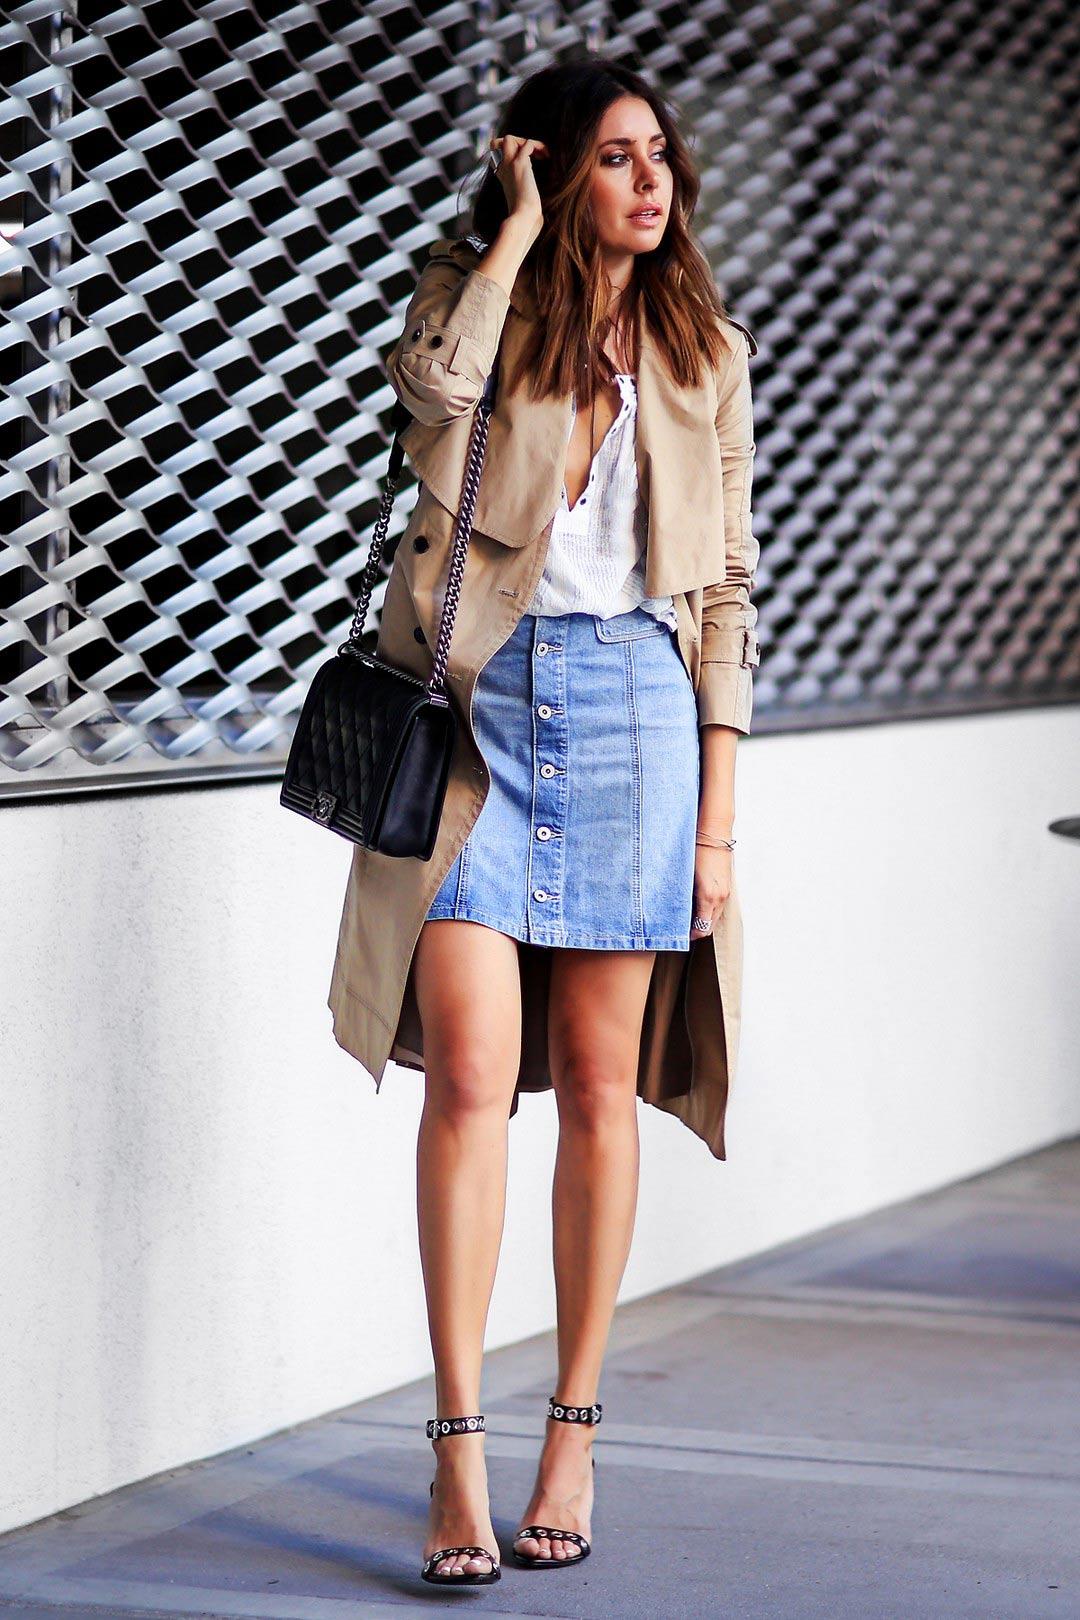 fashioned-chic-denim-skirt